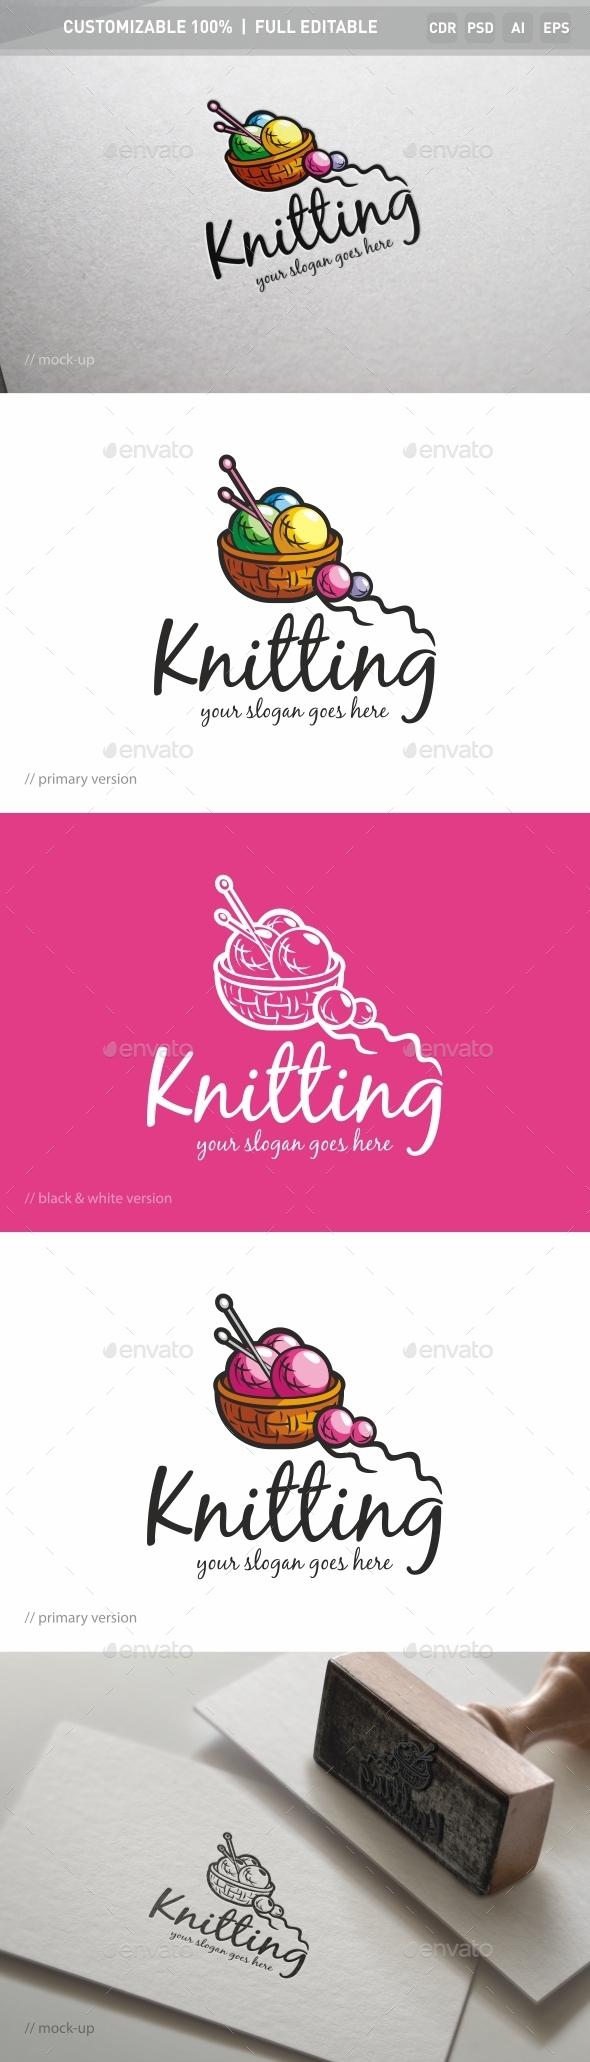 Knitting Logo Template - Objects Logo Templates